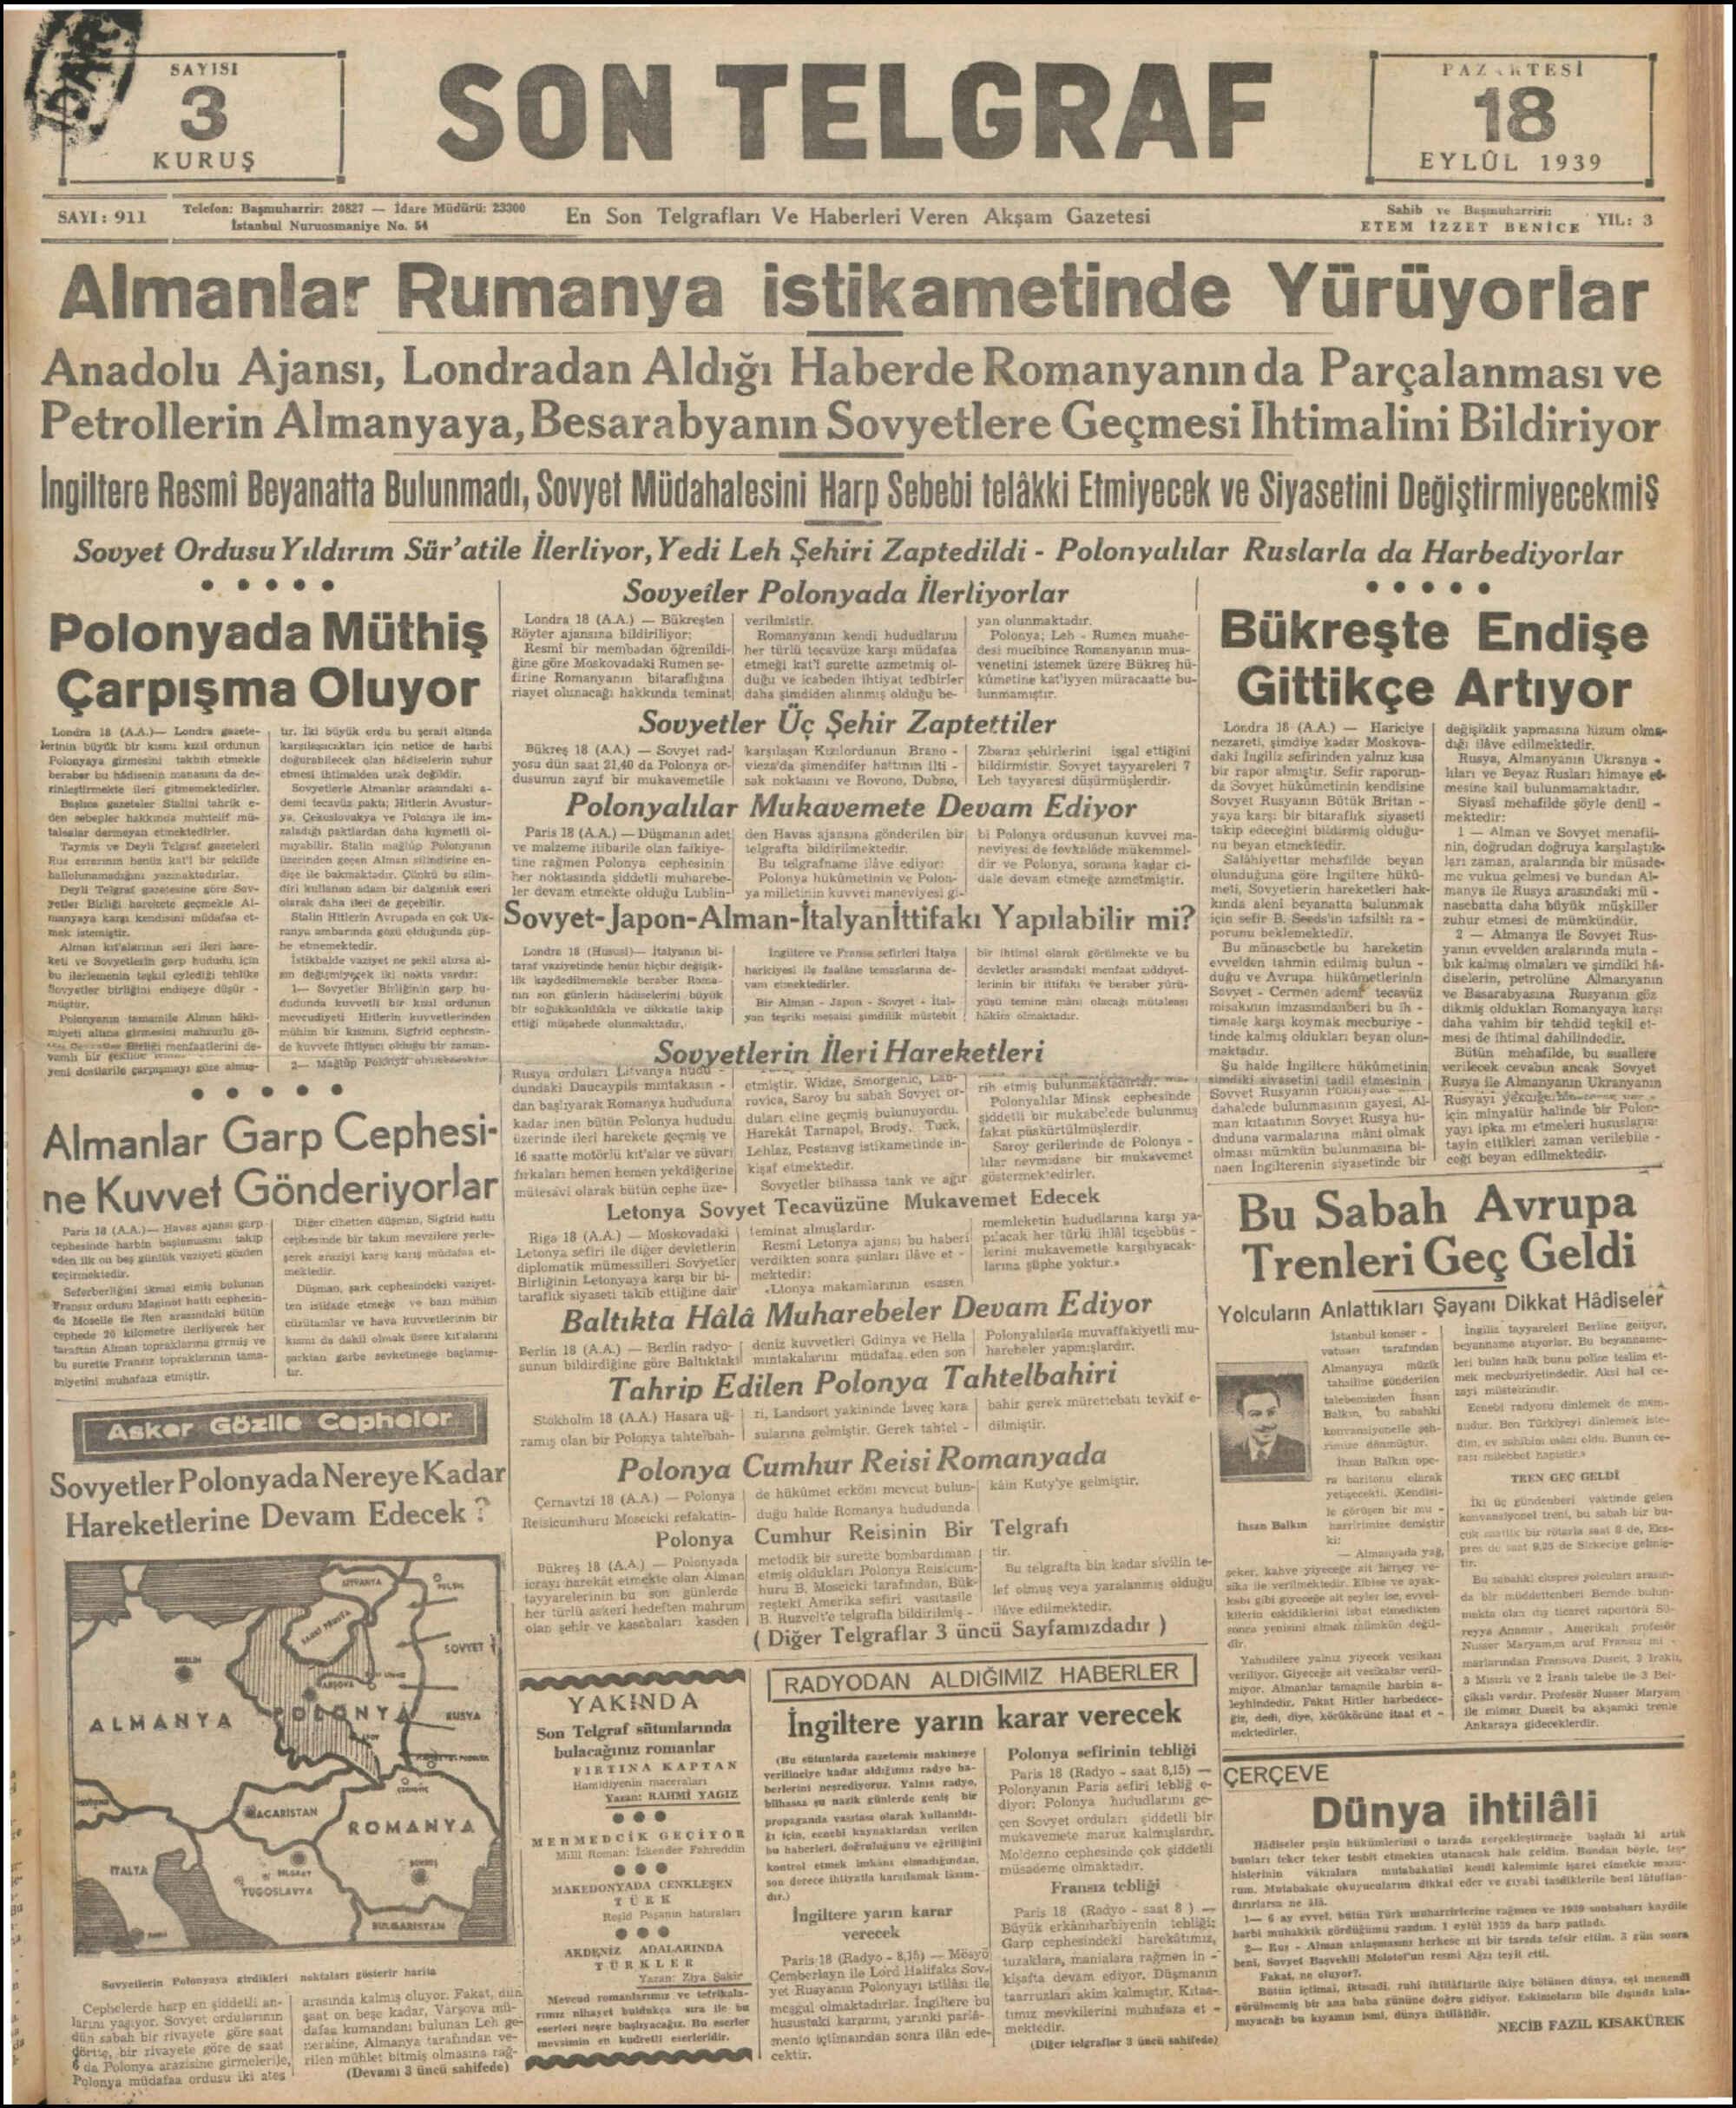 18 Eylül 1939 Tarihli Son Telgraf Dergisi Sayfa 1